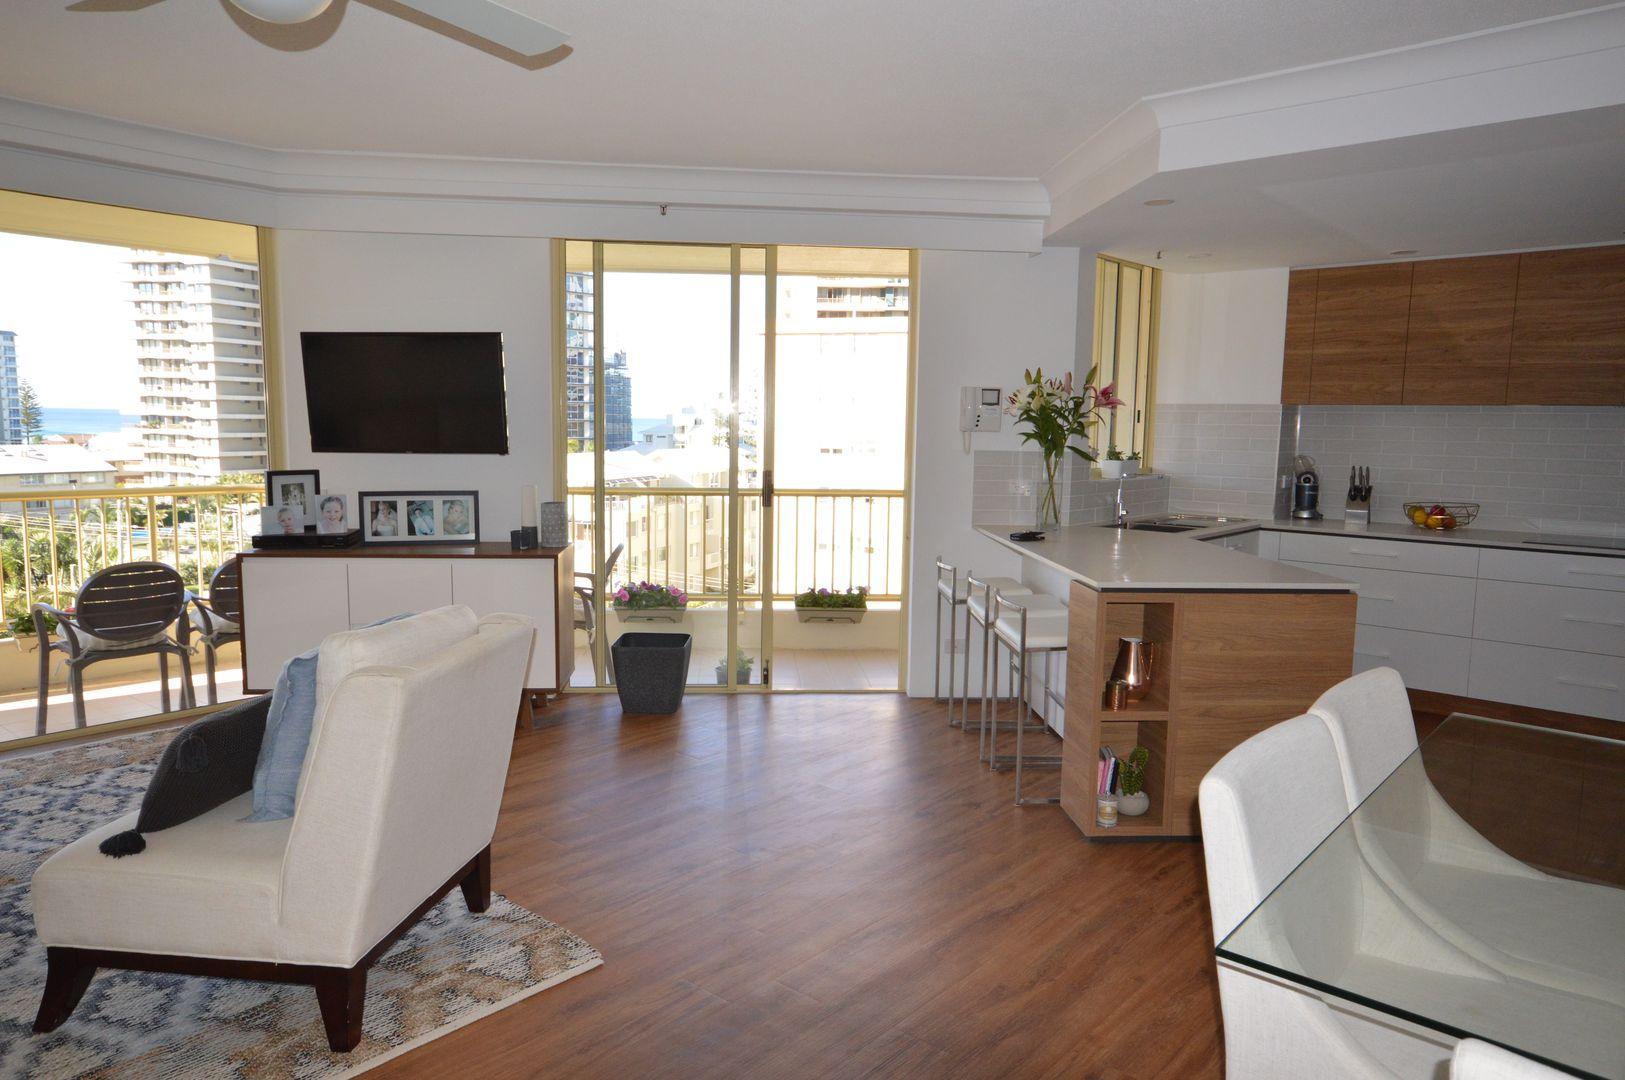 63/1 'Contessa' Serisier Ave, Main Beach QLD 4217, Image 2